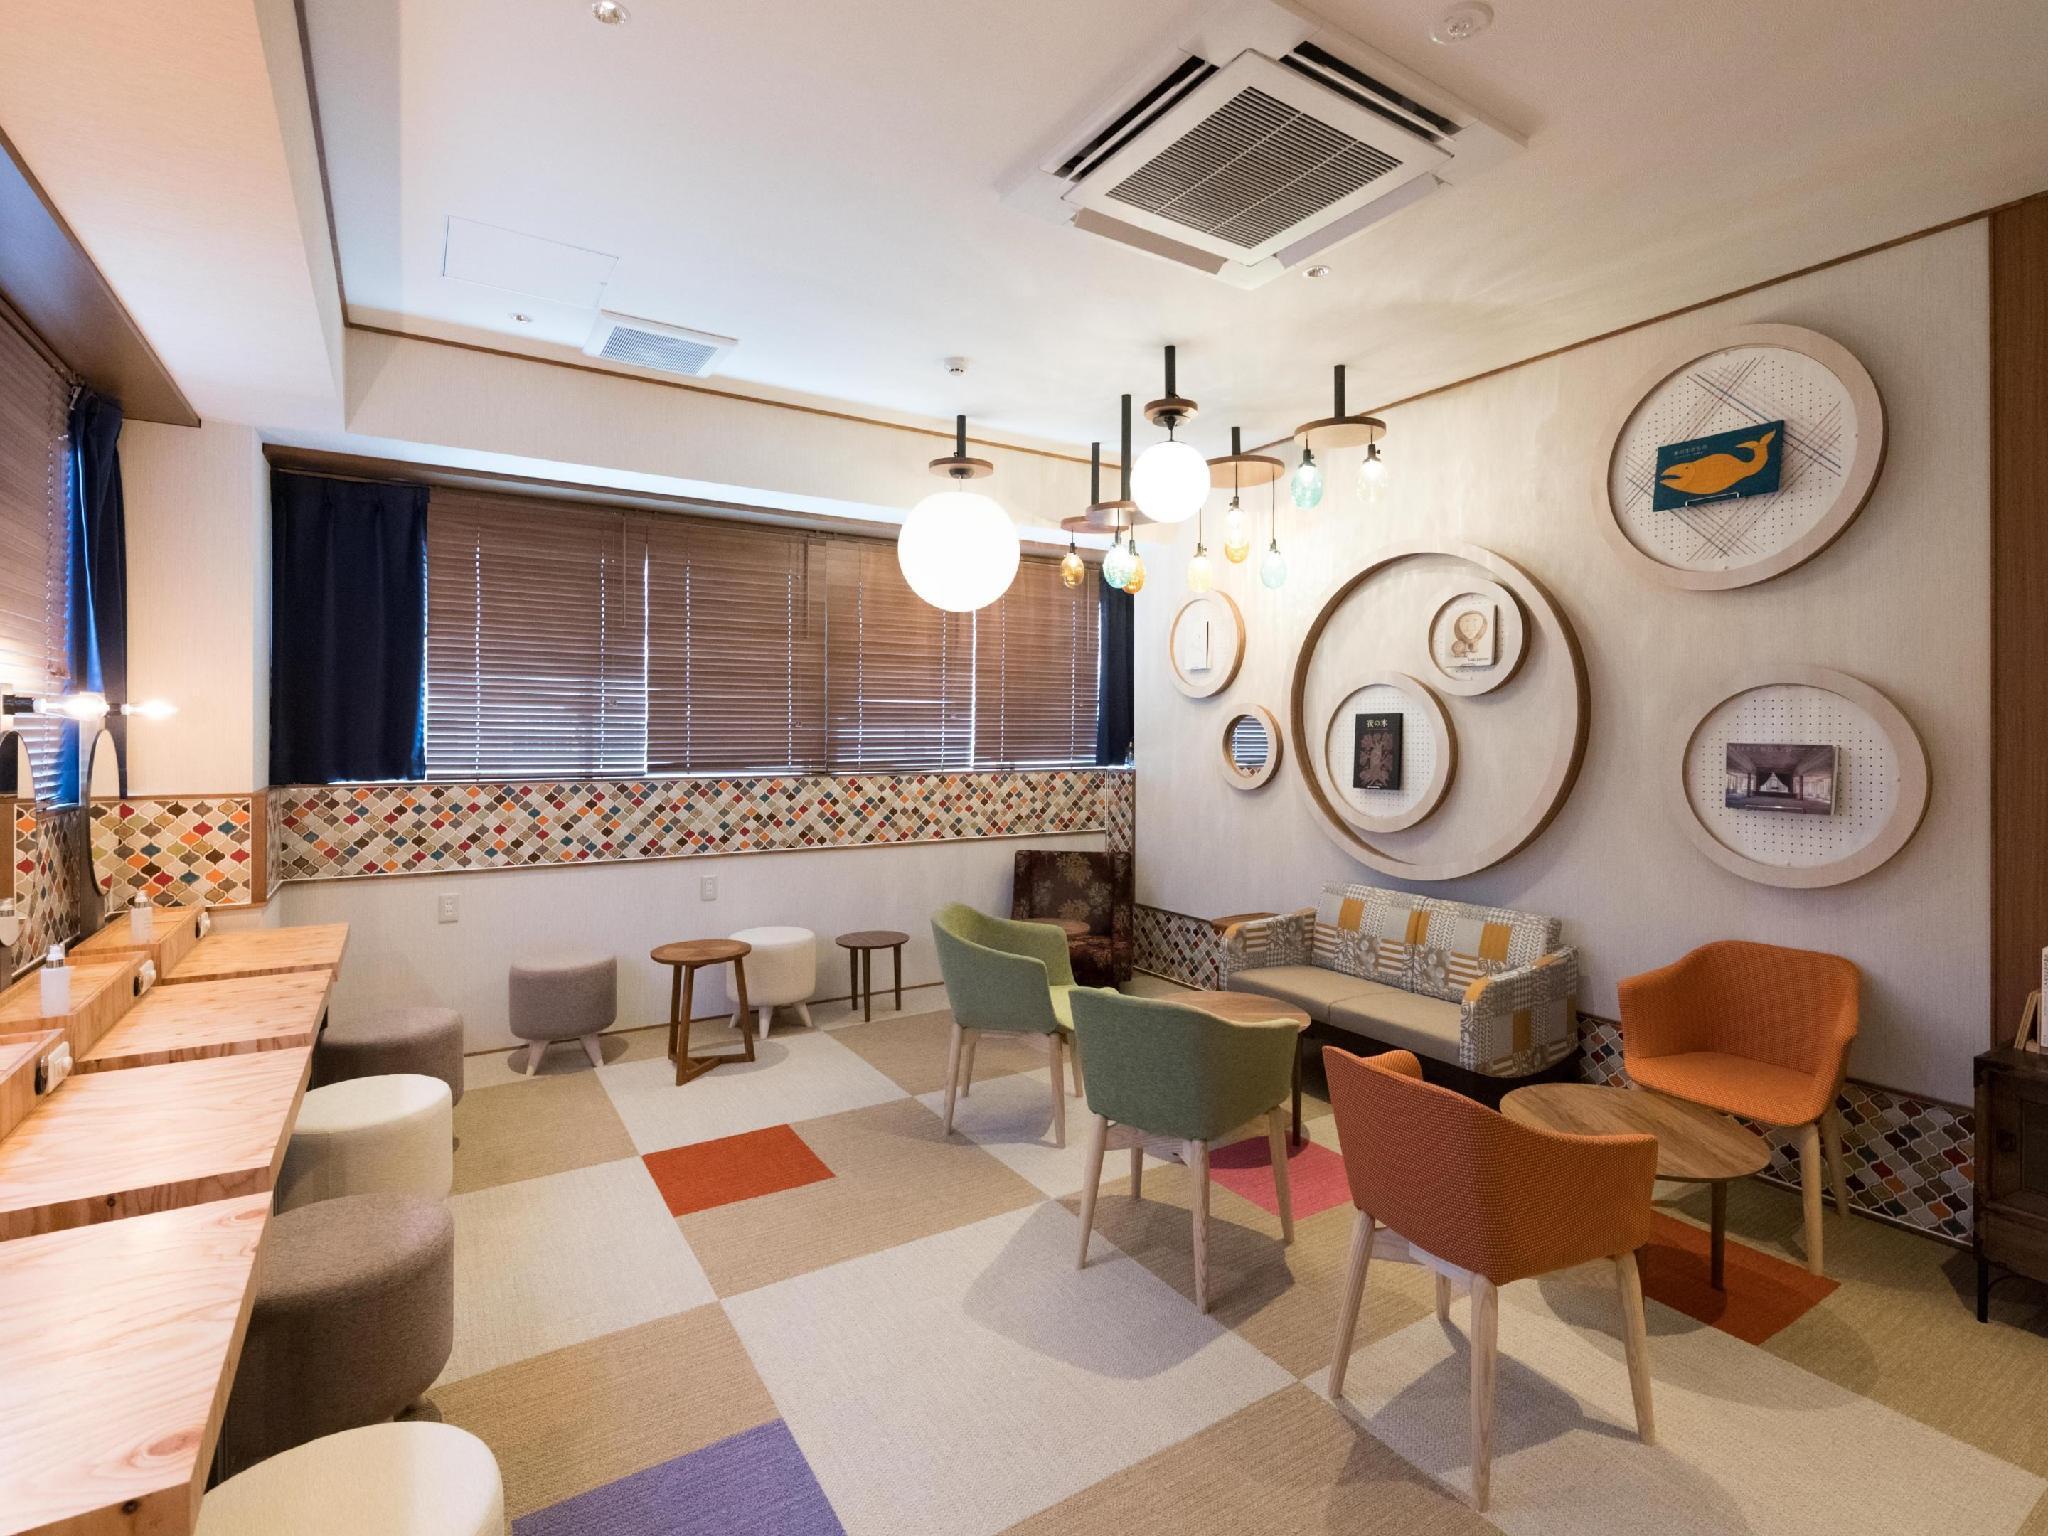 Matsue Urban Hotel Cubic Room